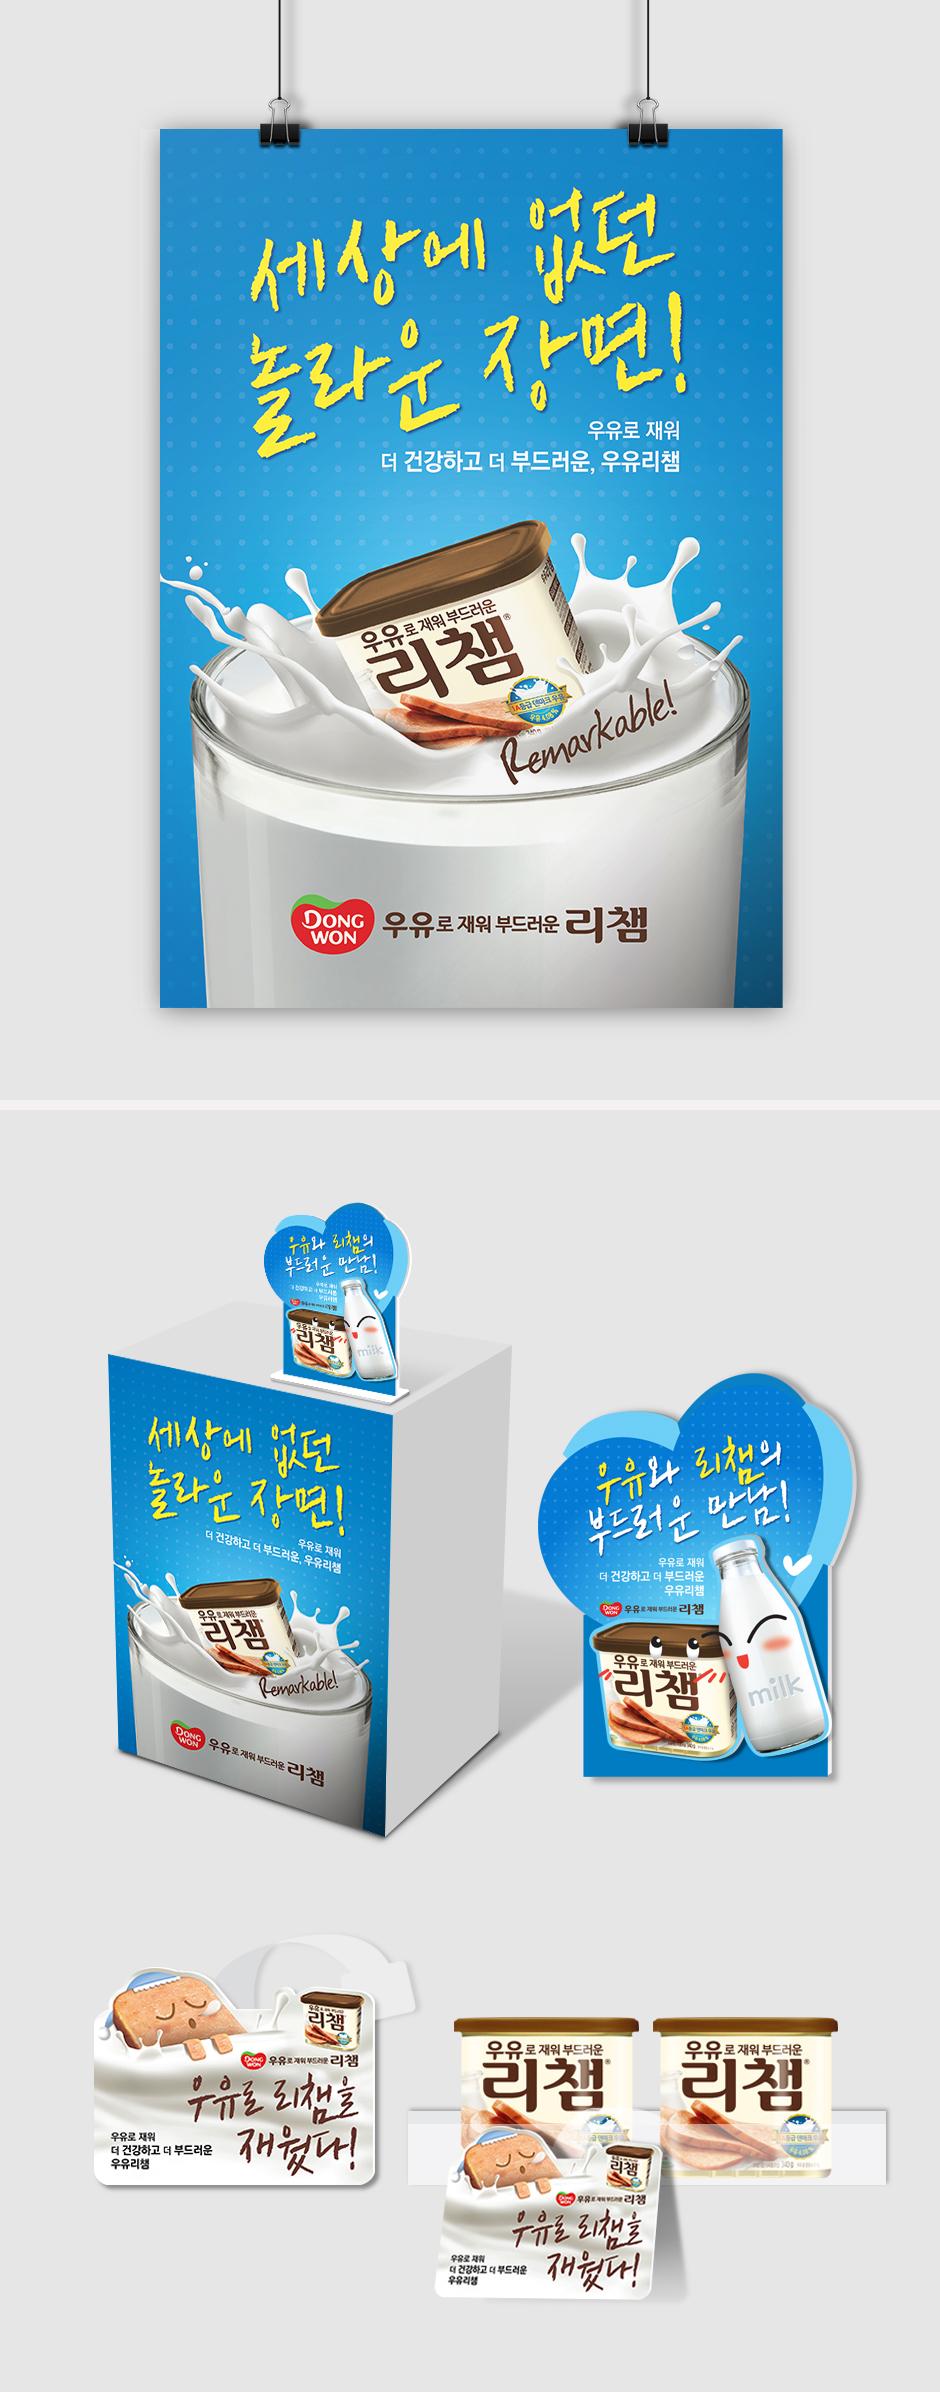 DONGWON FnB Milk Richam 2015